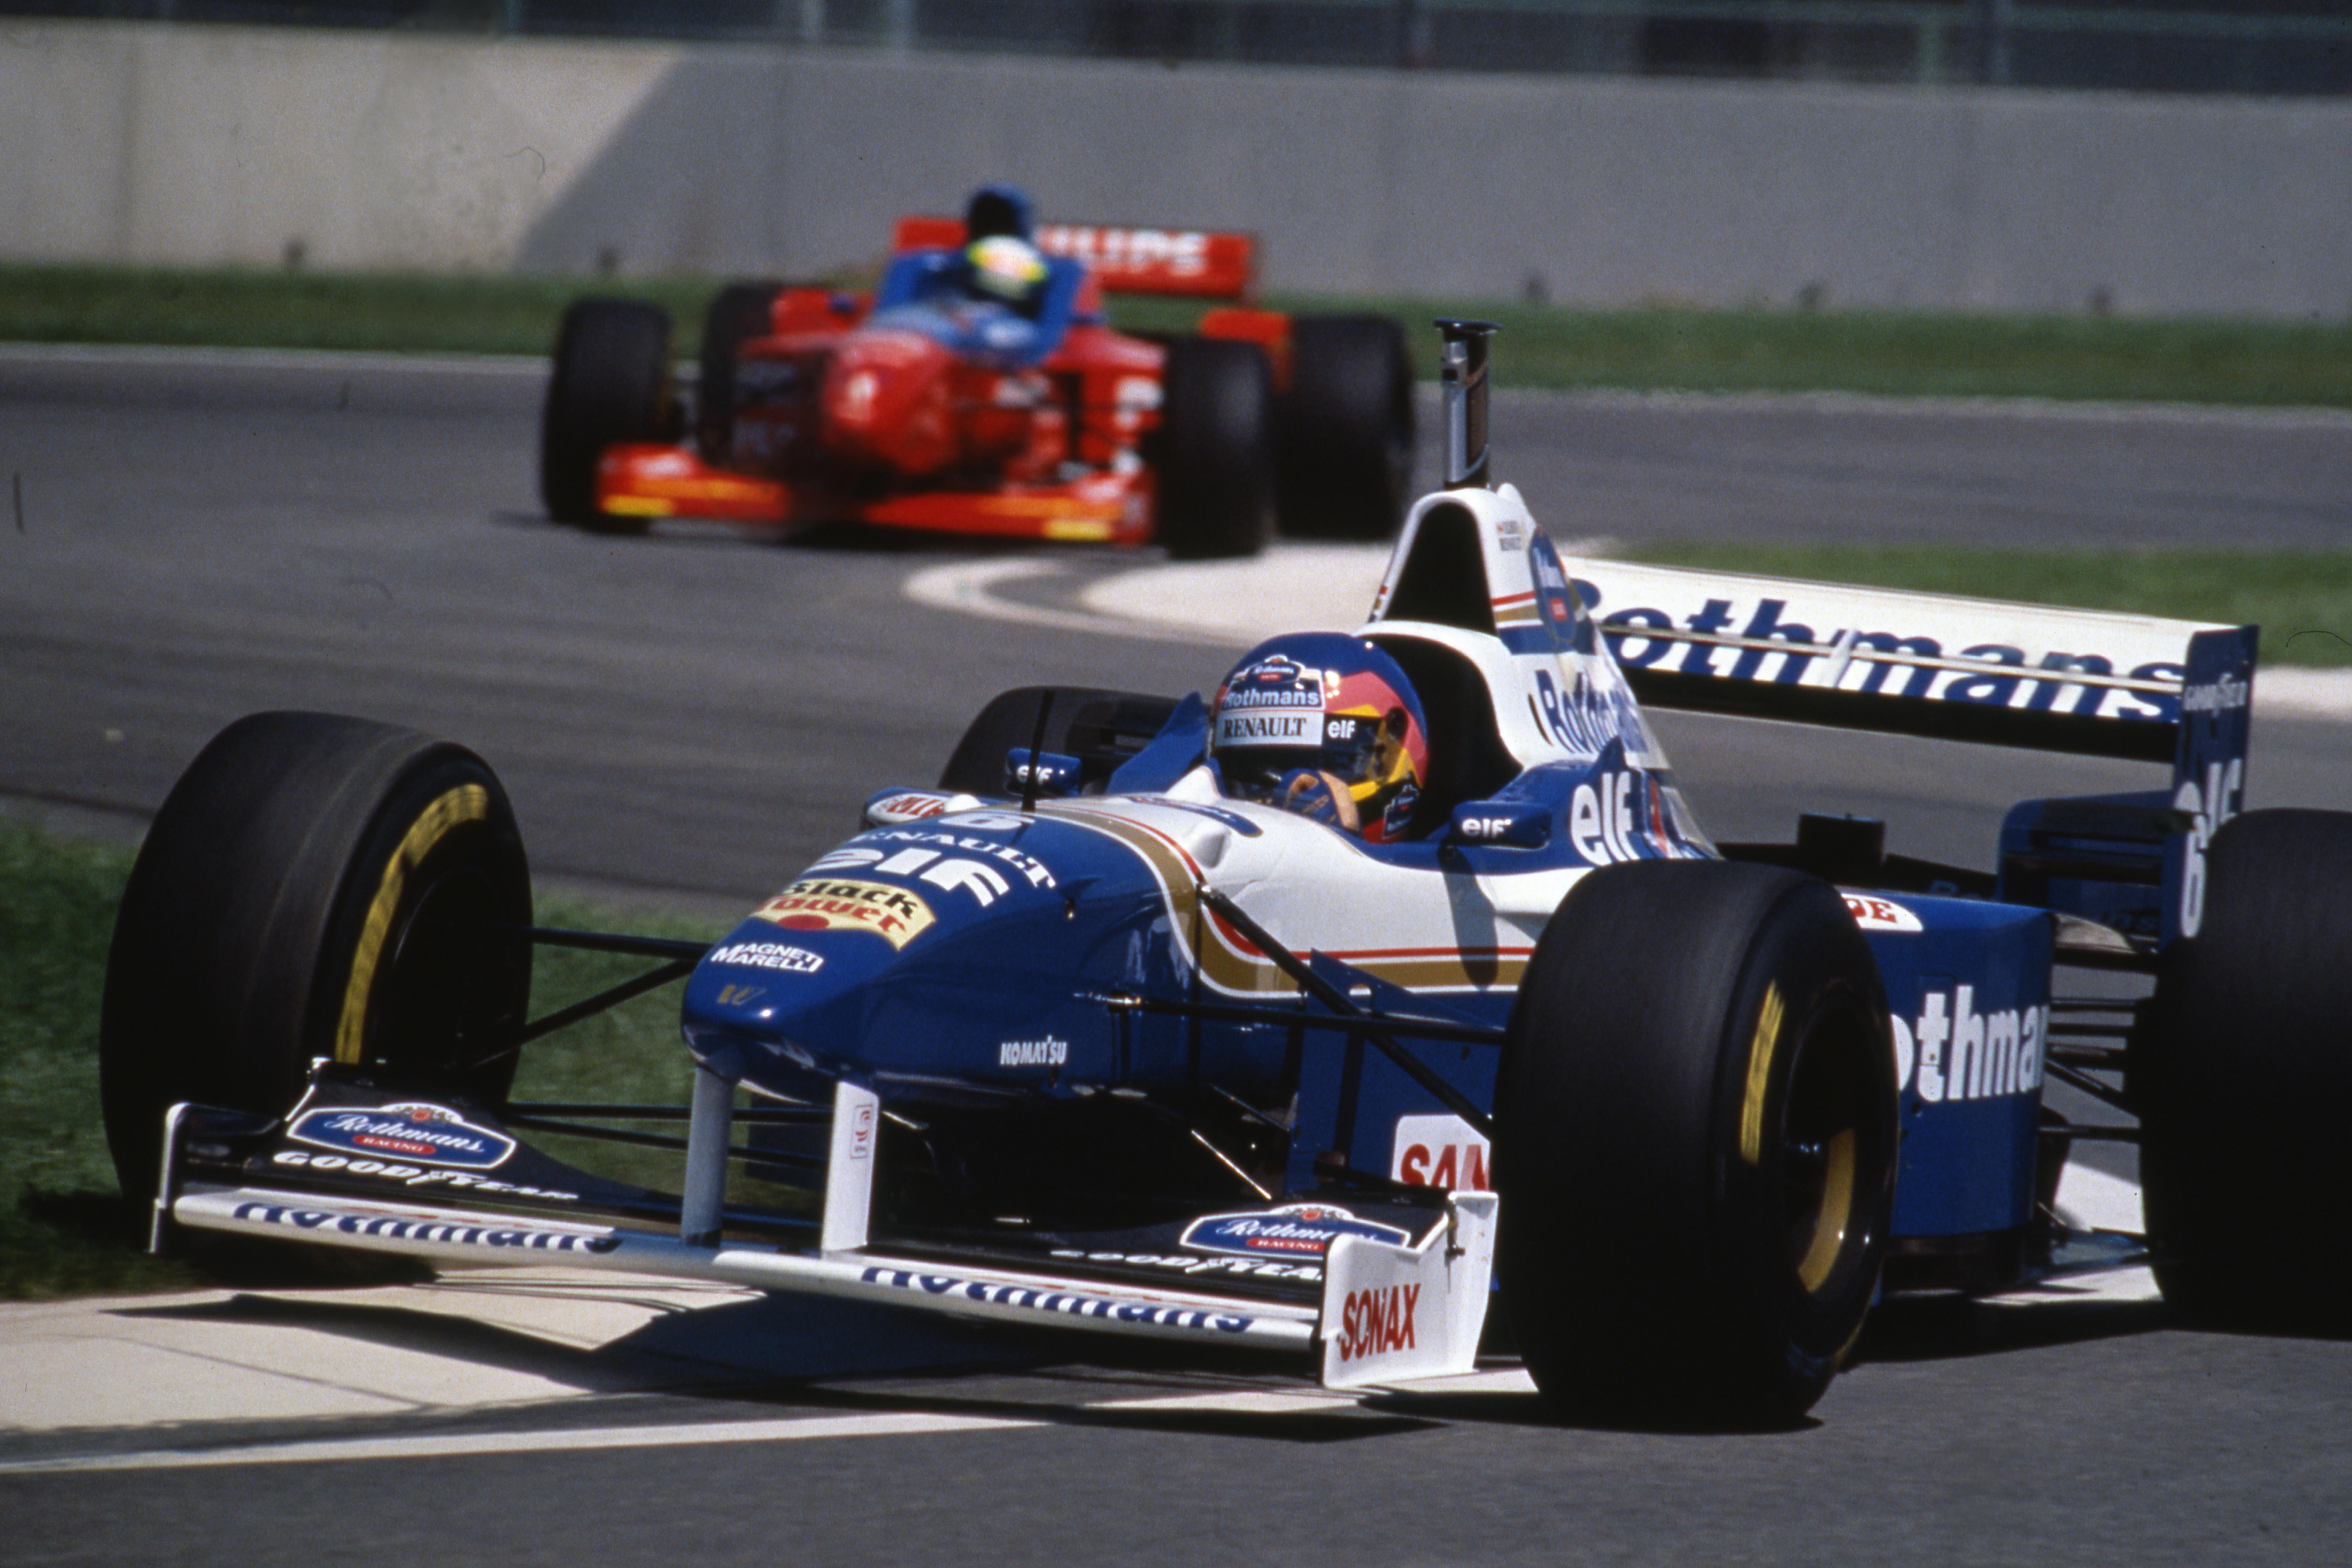 Jacques Villeneuve Williams San Marino Grand Prix 1996 Imola